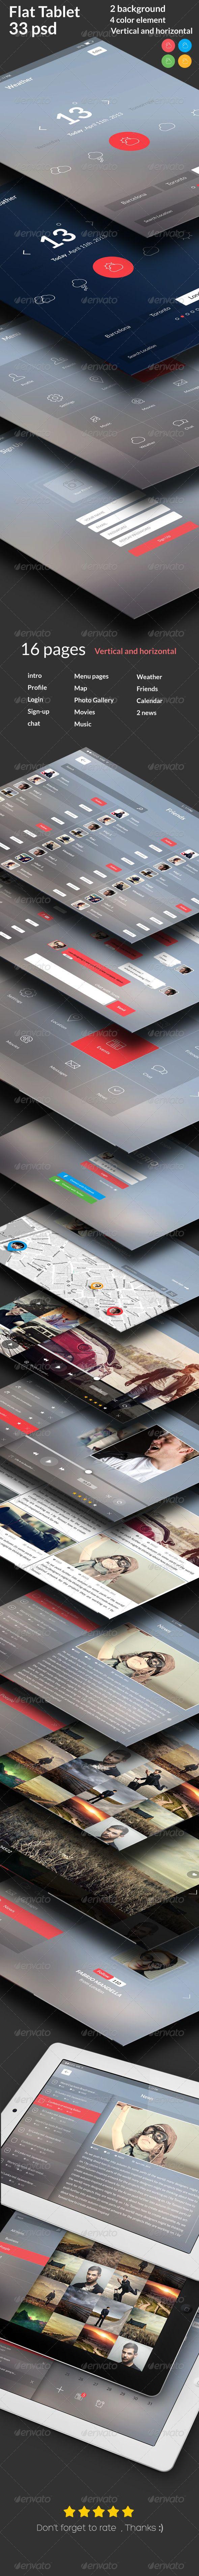 Flat Tablet UI KIT - User Interfaces Web Elements